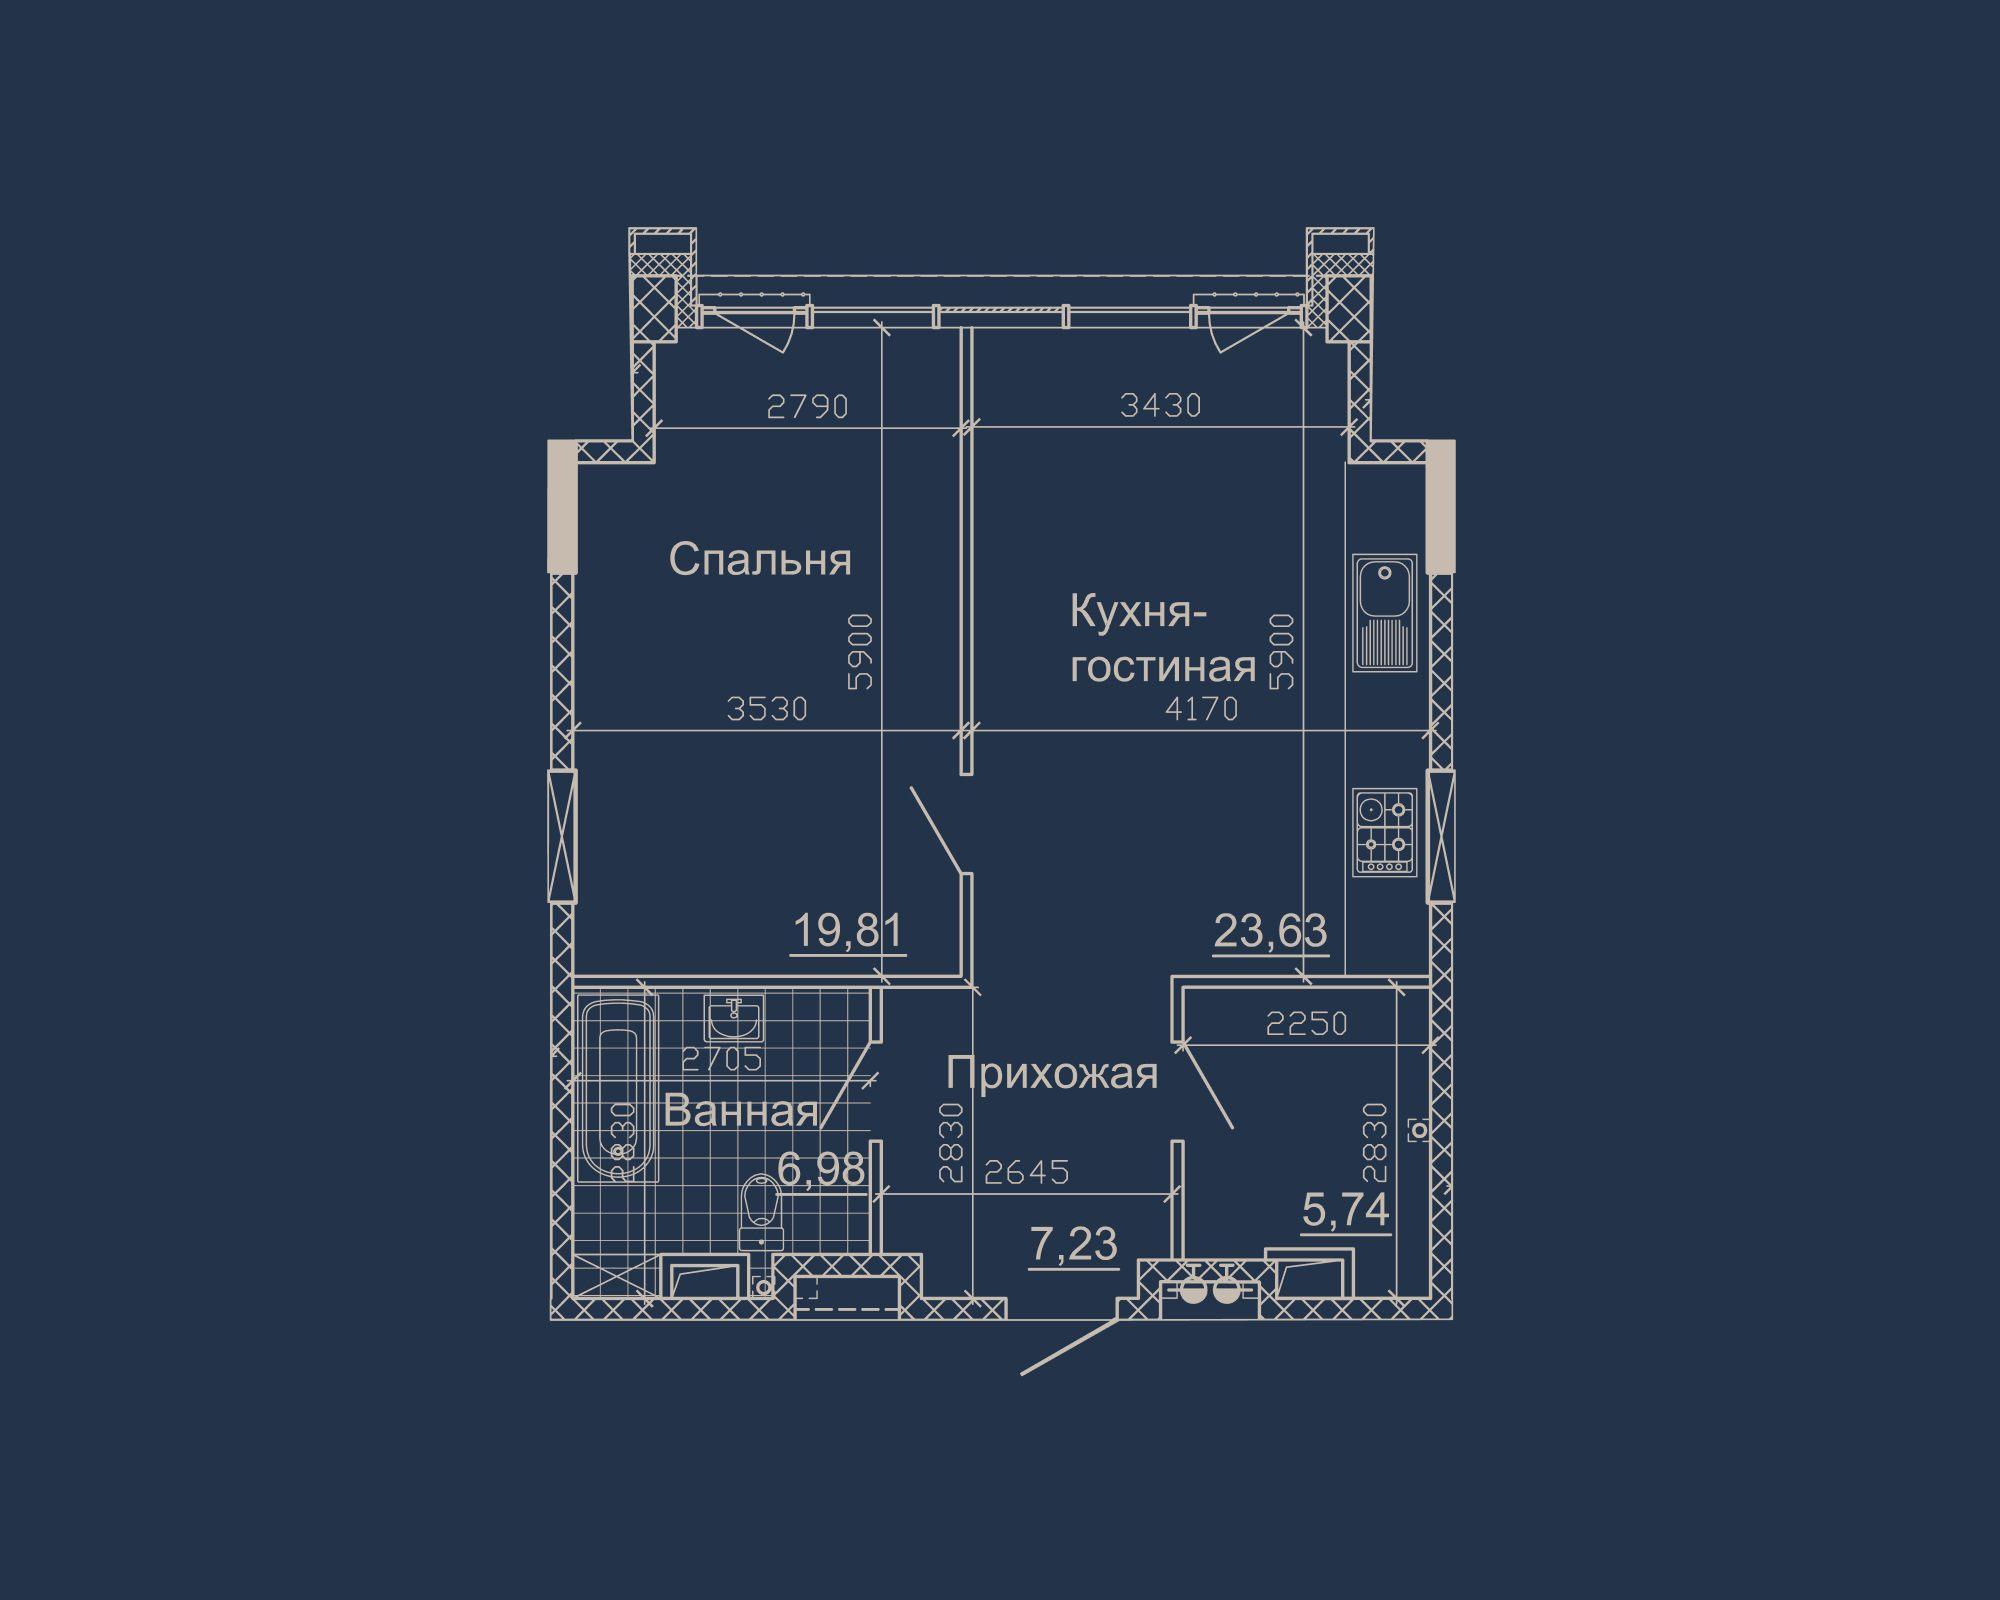 1-кімнатна квартира типу 05А-1 у ЖК Nebo